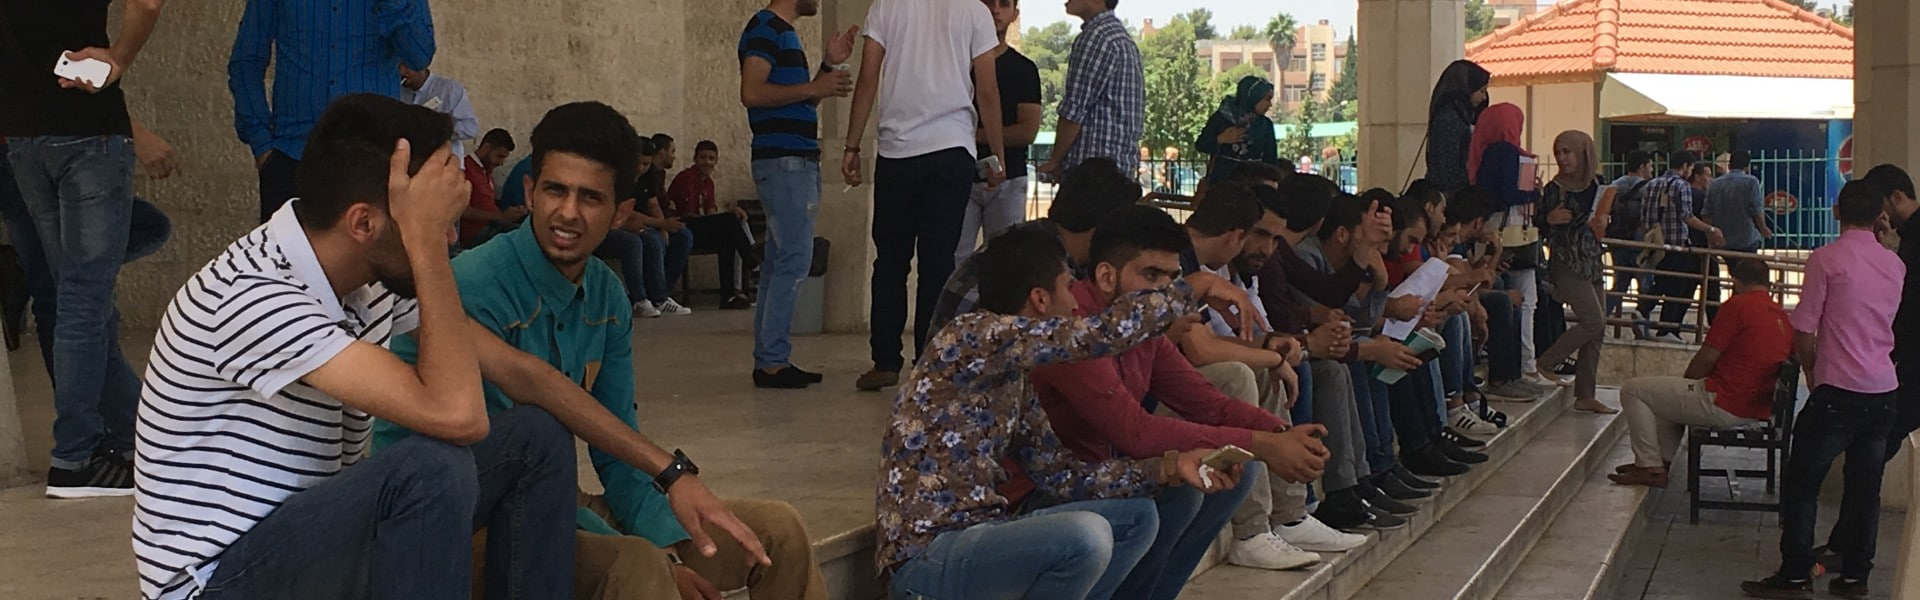 Training on digital media for mid-career journalists in Jordan